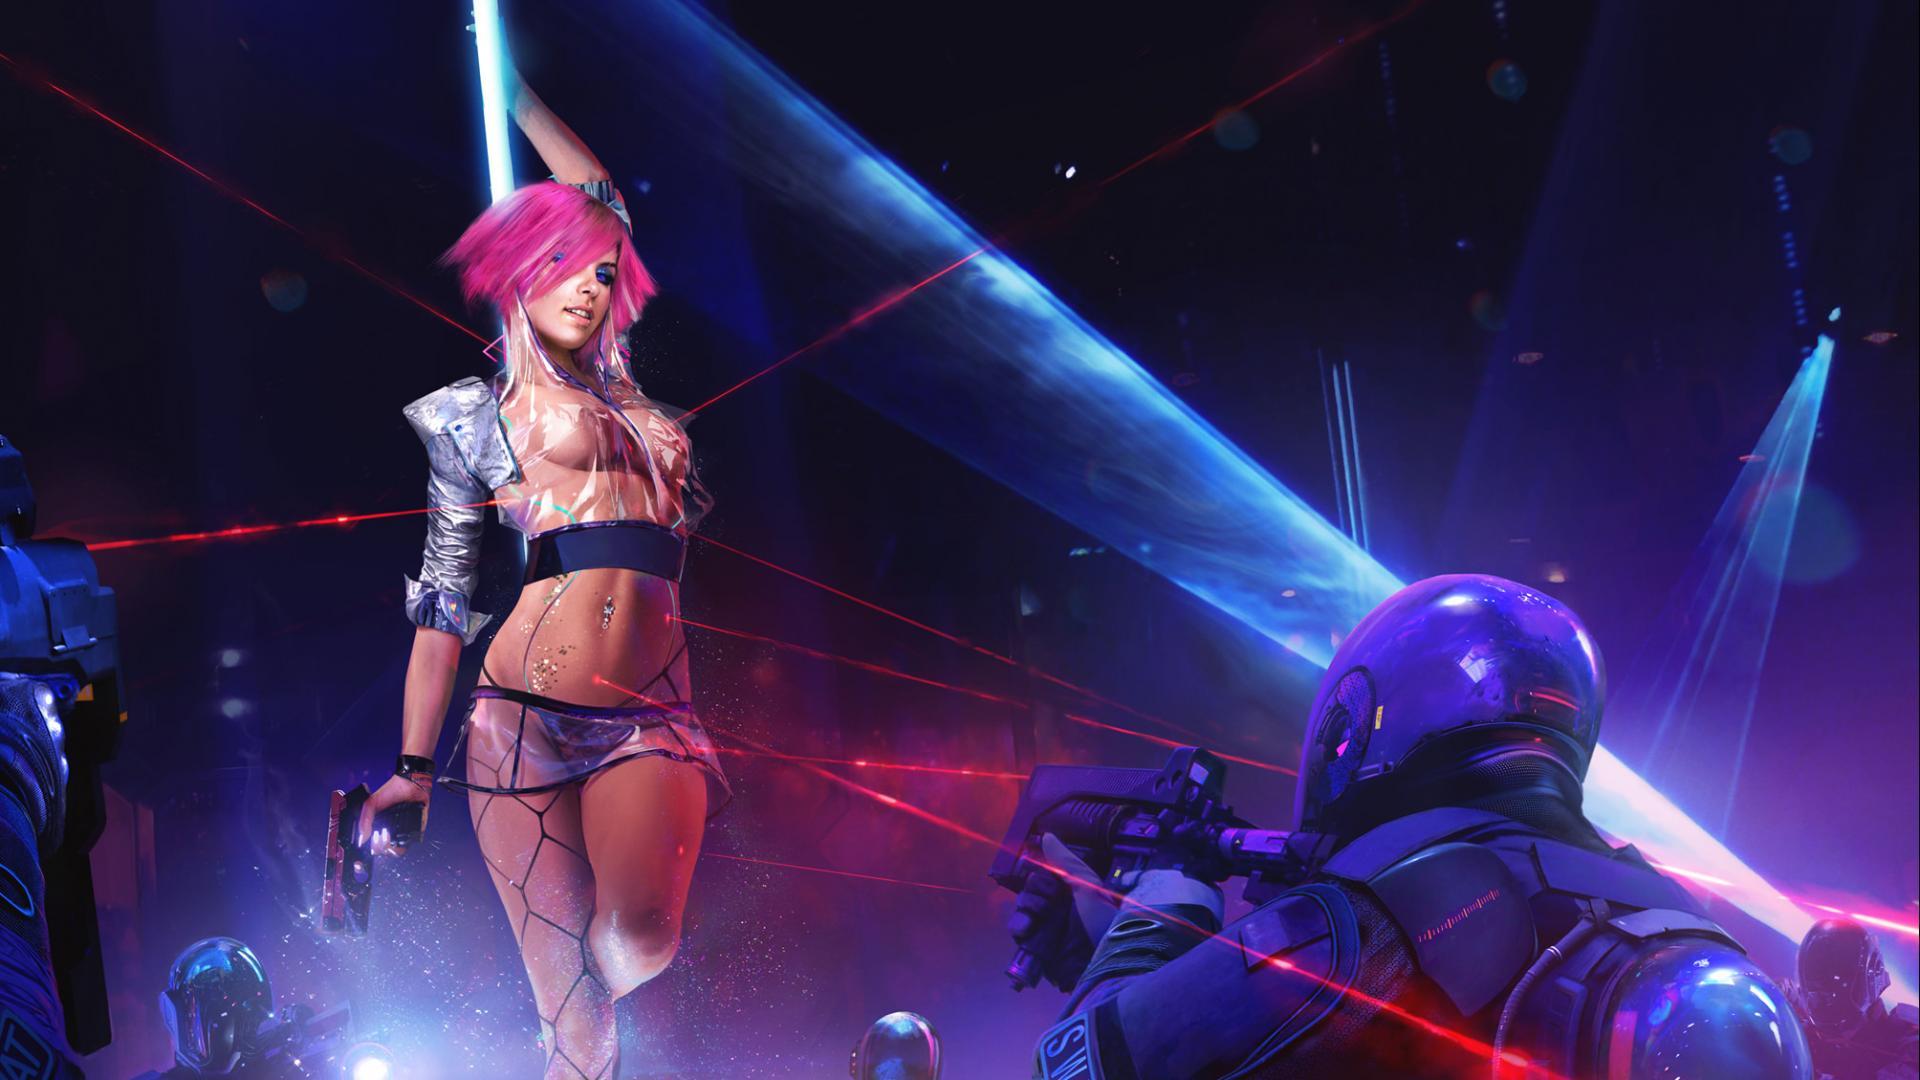 CD Projekt RED: Мультиплеер для Cyberpunk 2077 находится в разработке